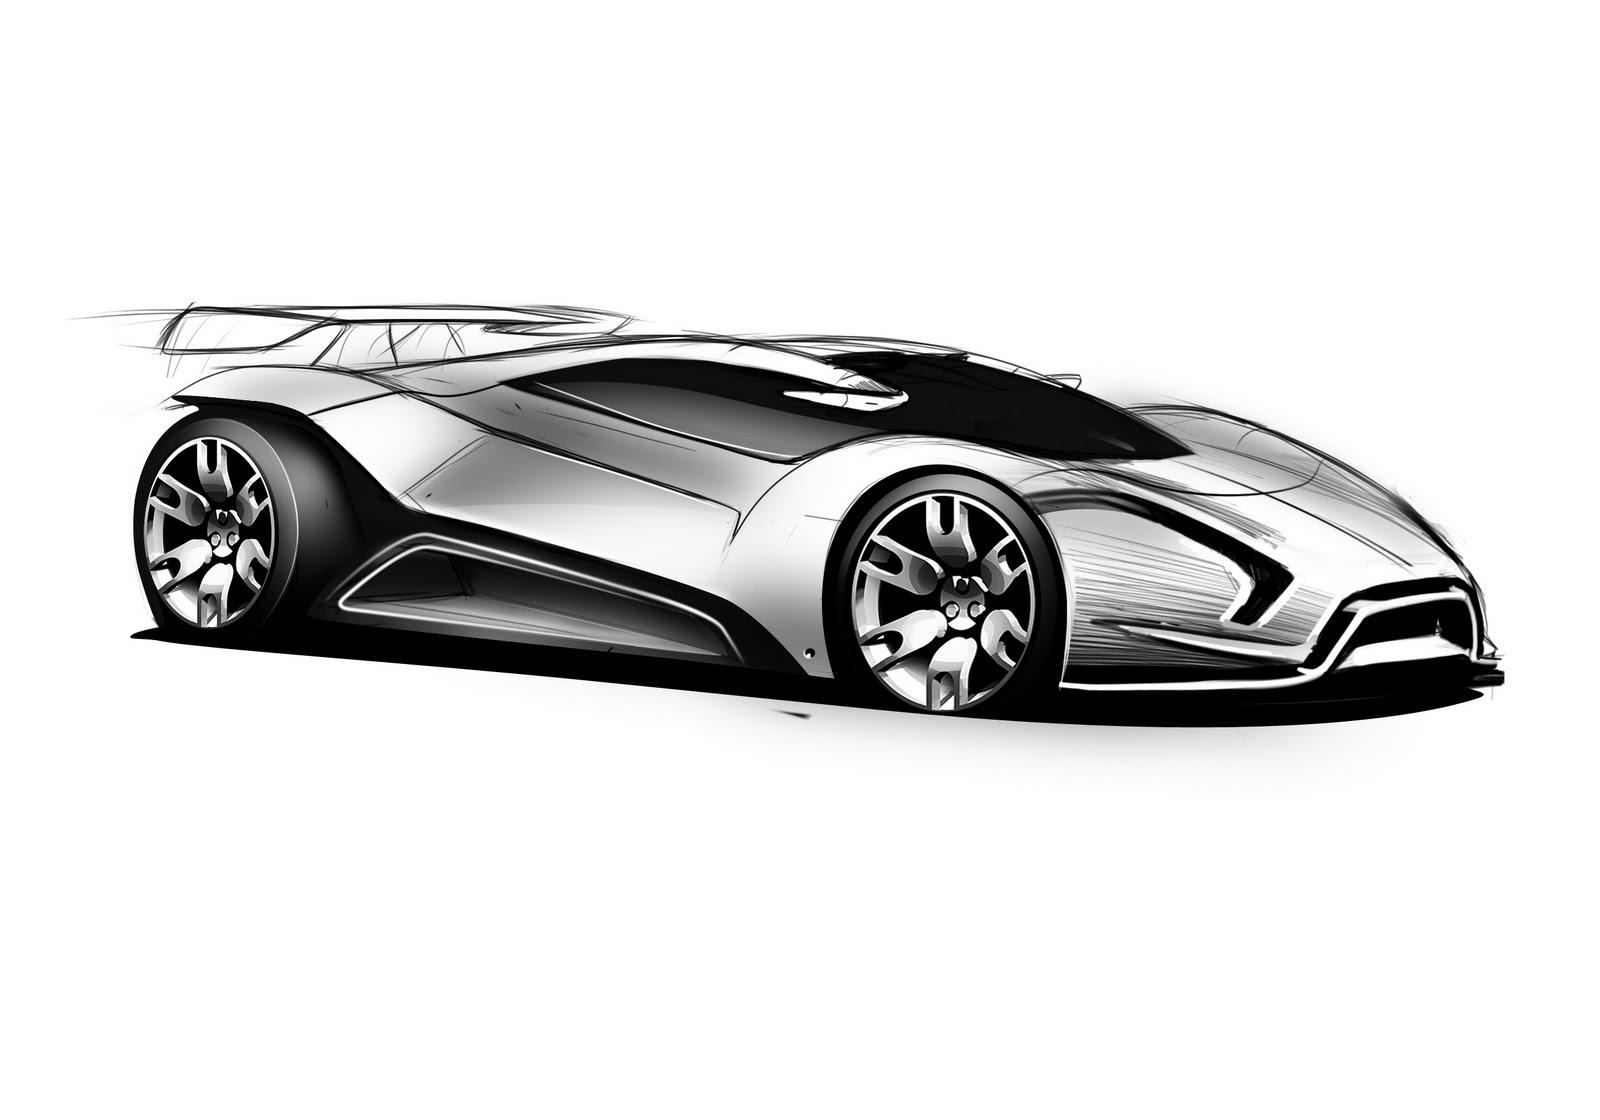 Ferrari Concept Design Sketch Car Body Design On Wookmark